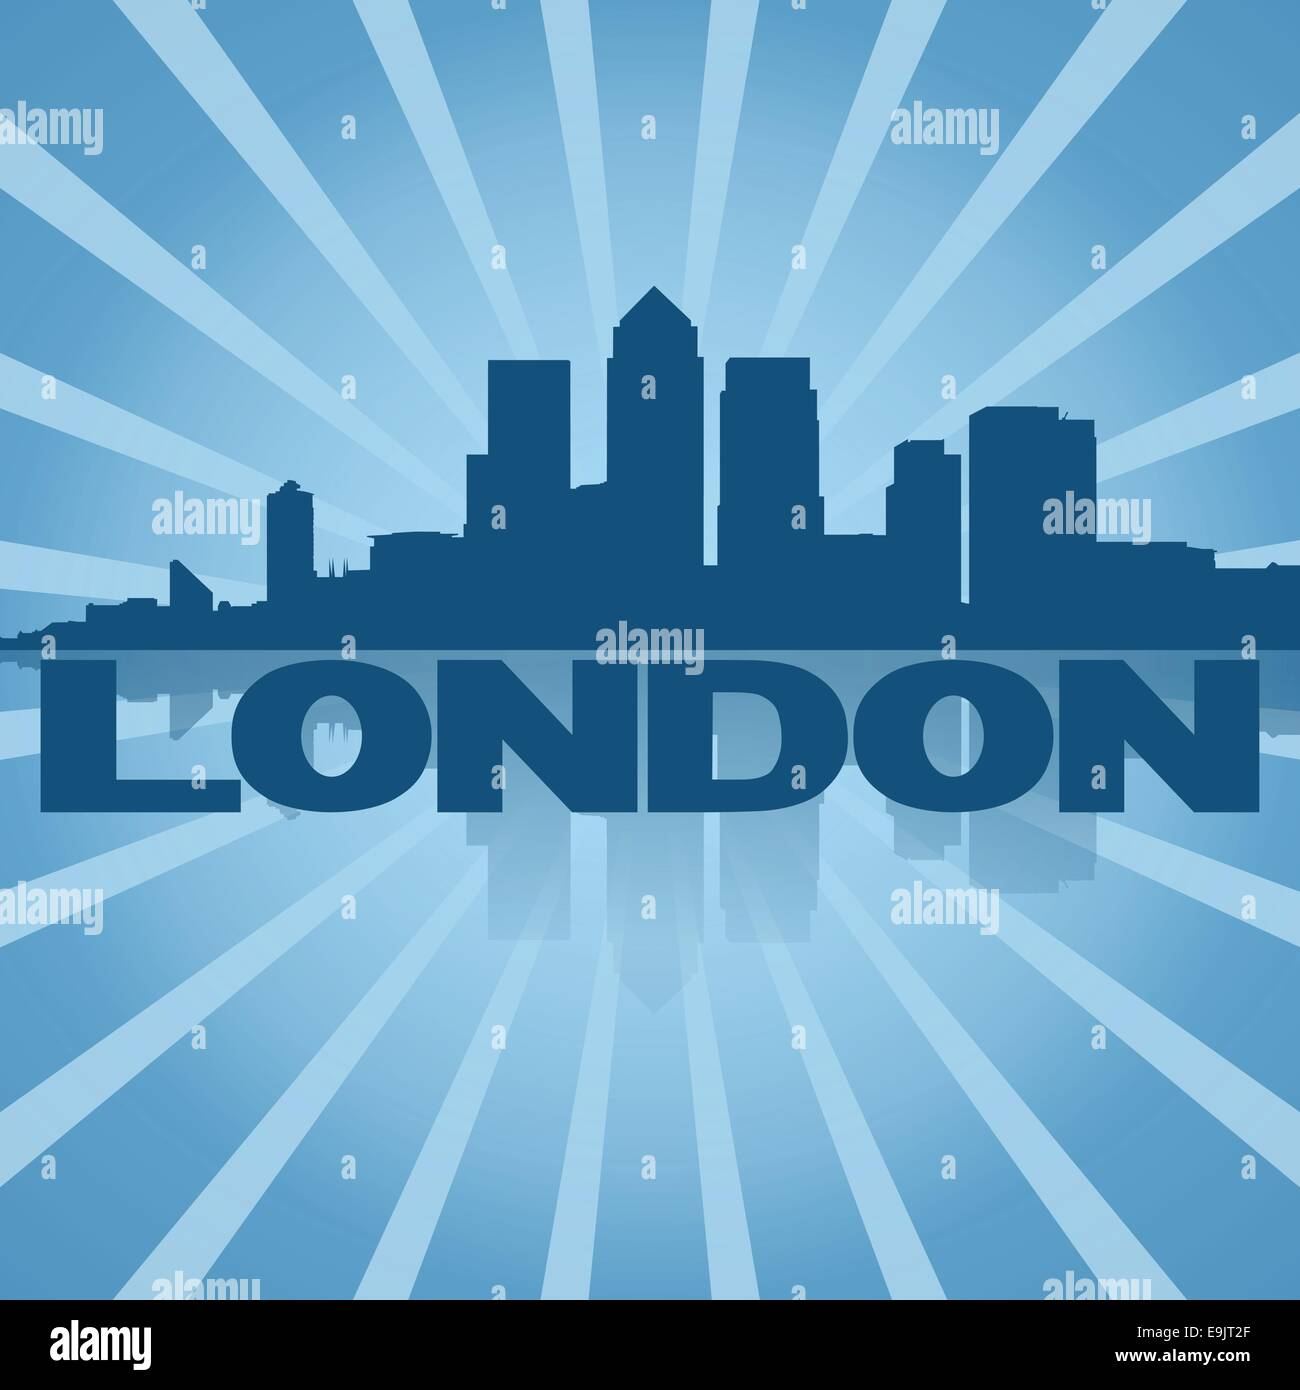 London Docklands skyline on blue sunburst illustration - Stock Vector